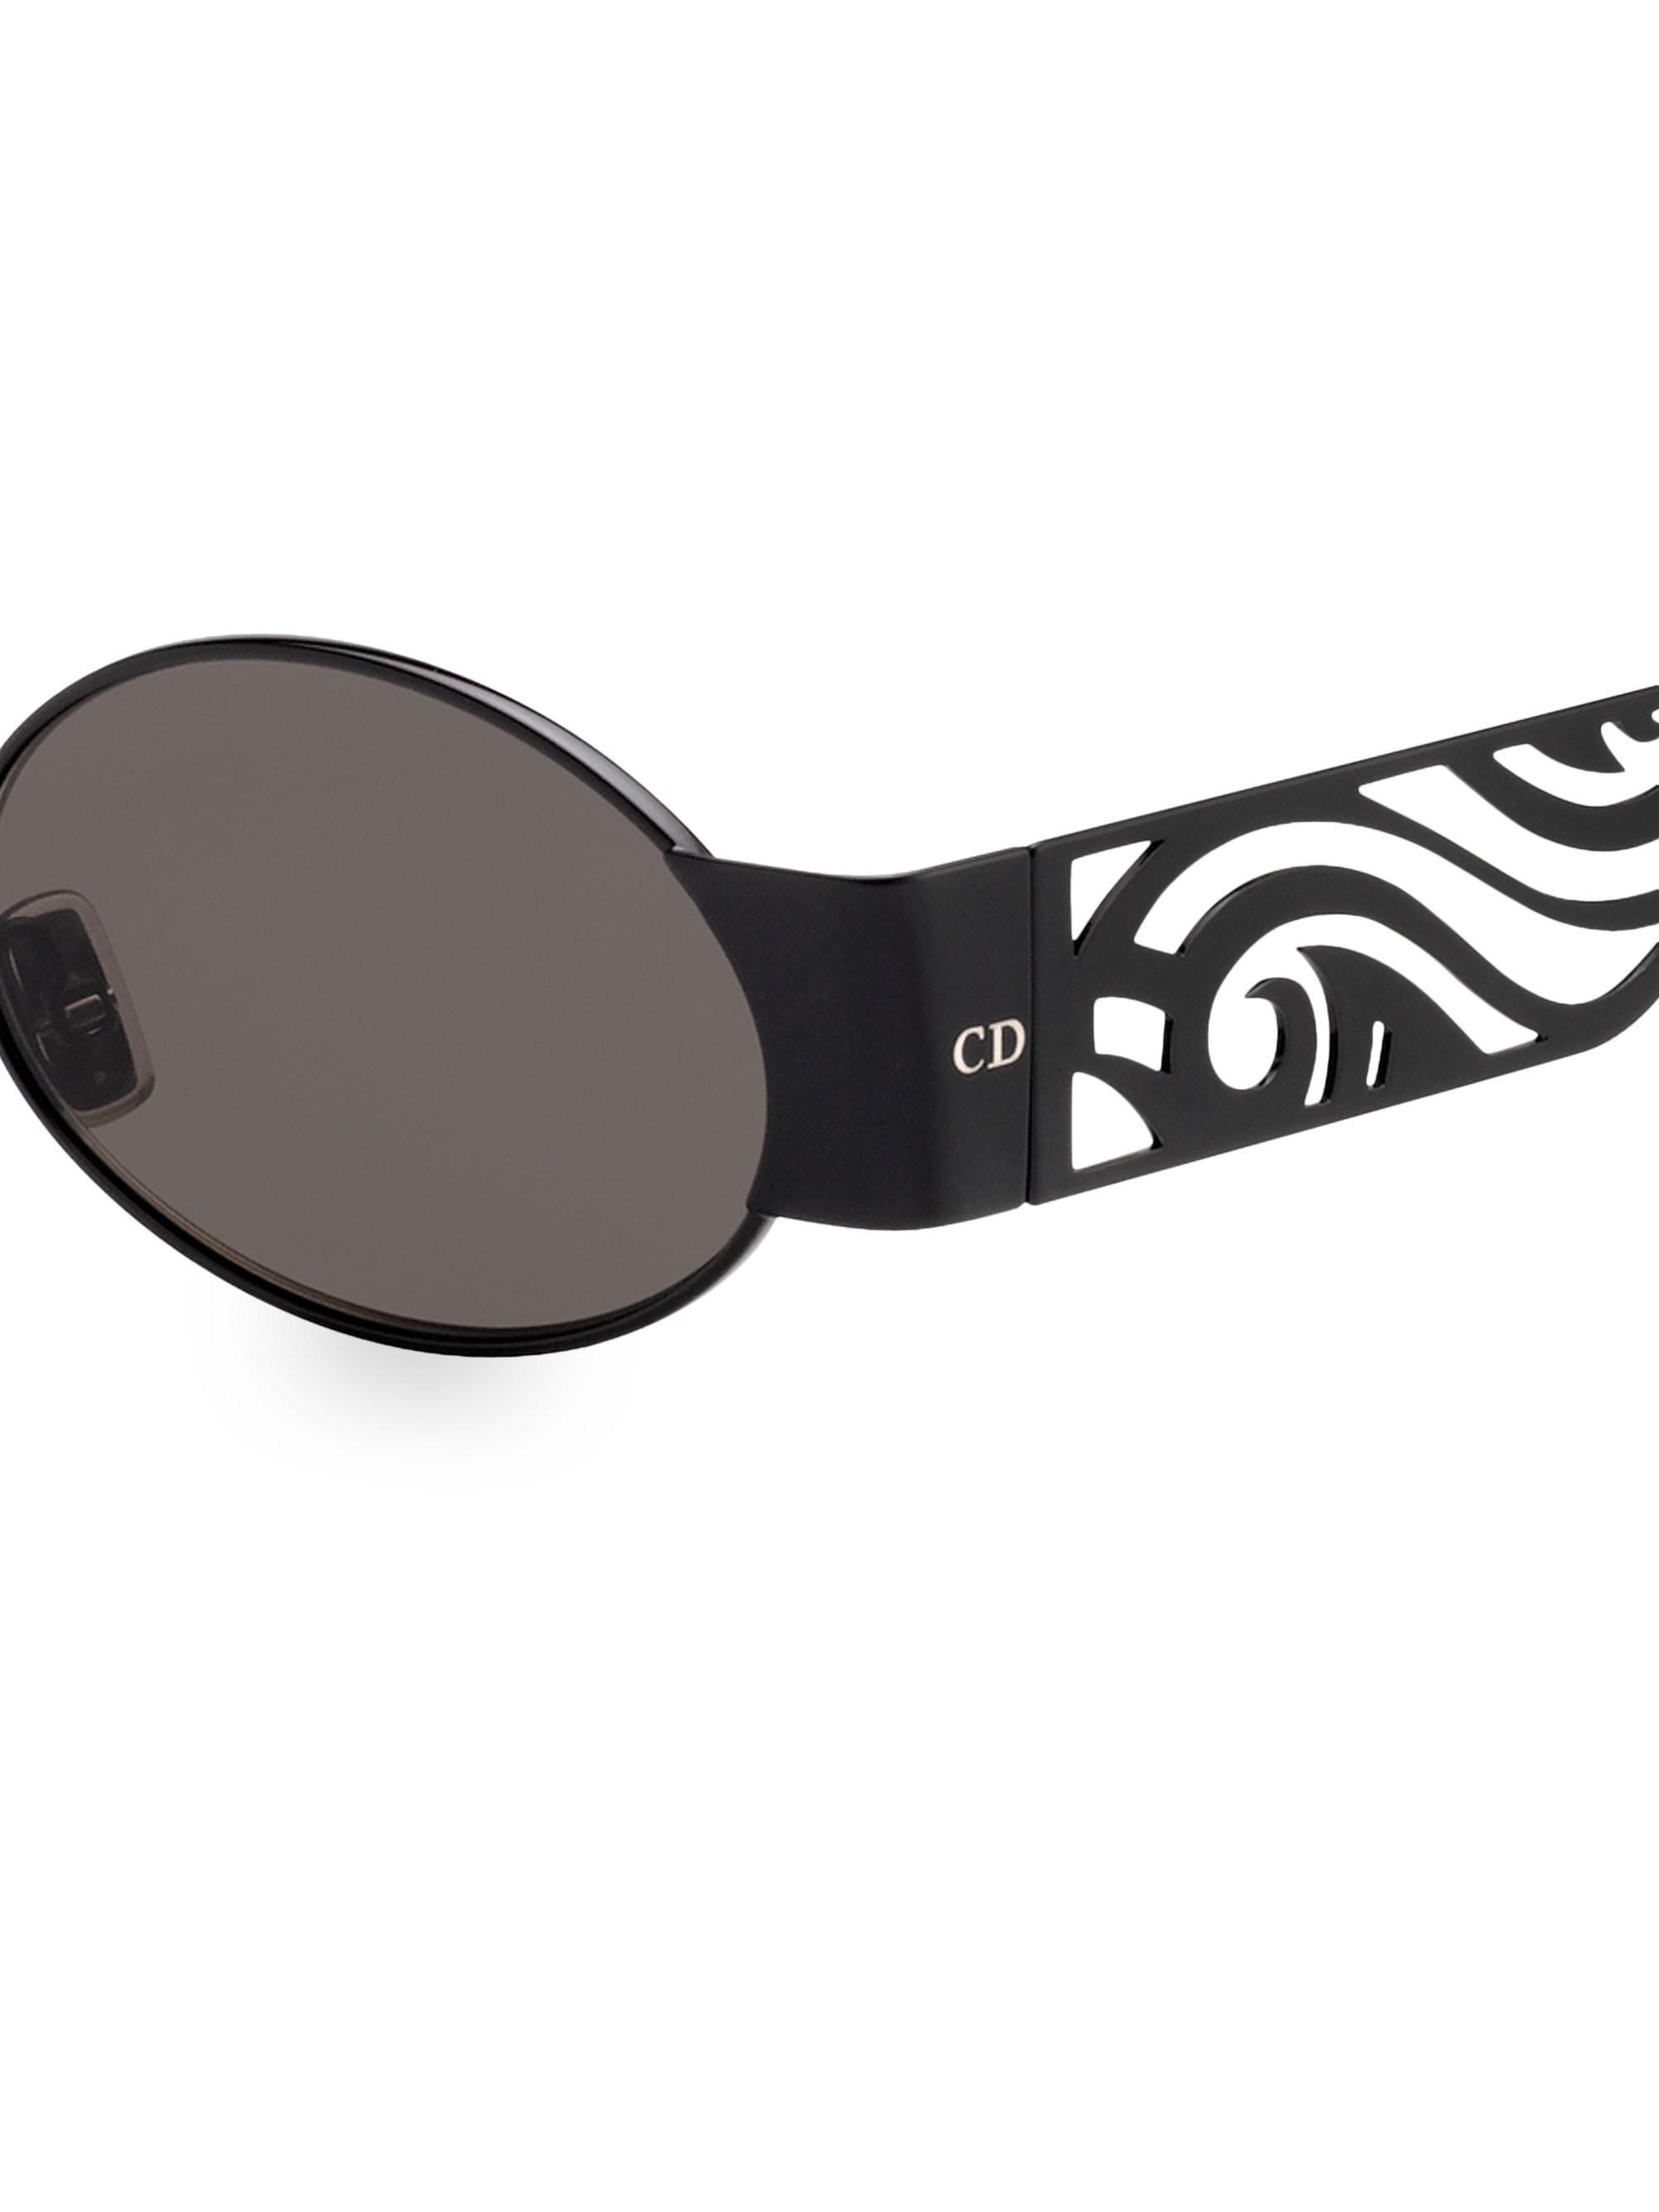 7dbbb6408fc3c Dior Homme - Black 51mm Round Rave Sunglasses for Men - Lyst. View  fullscreen